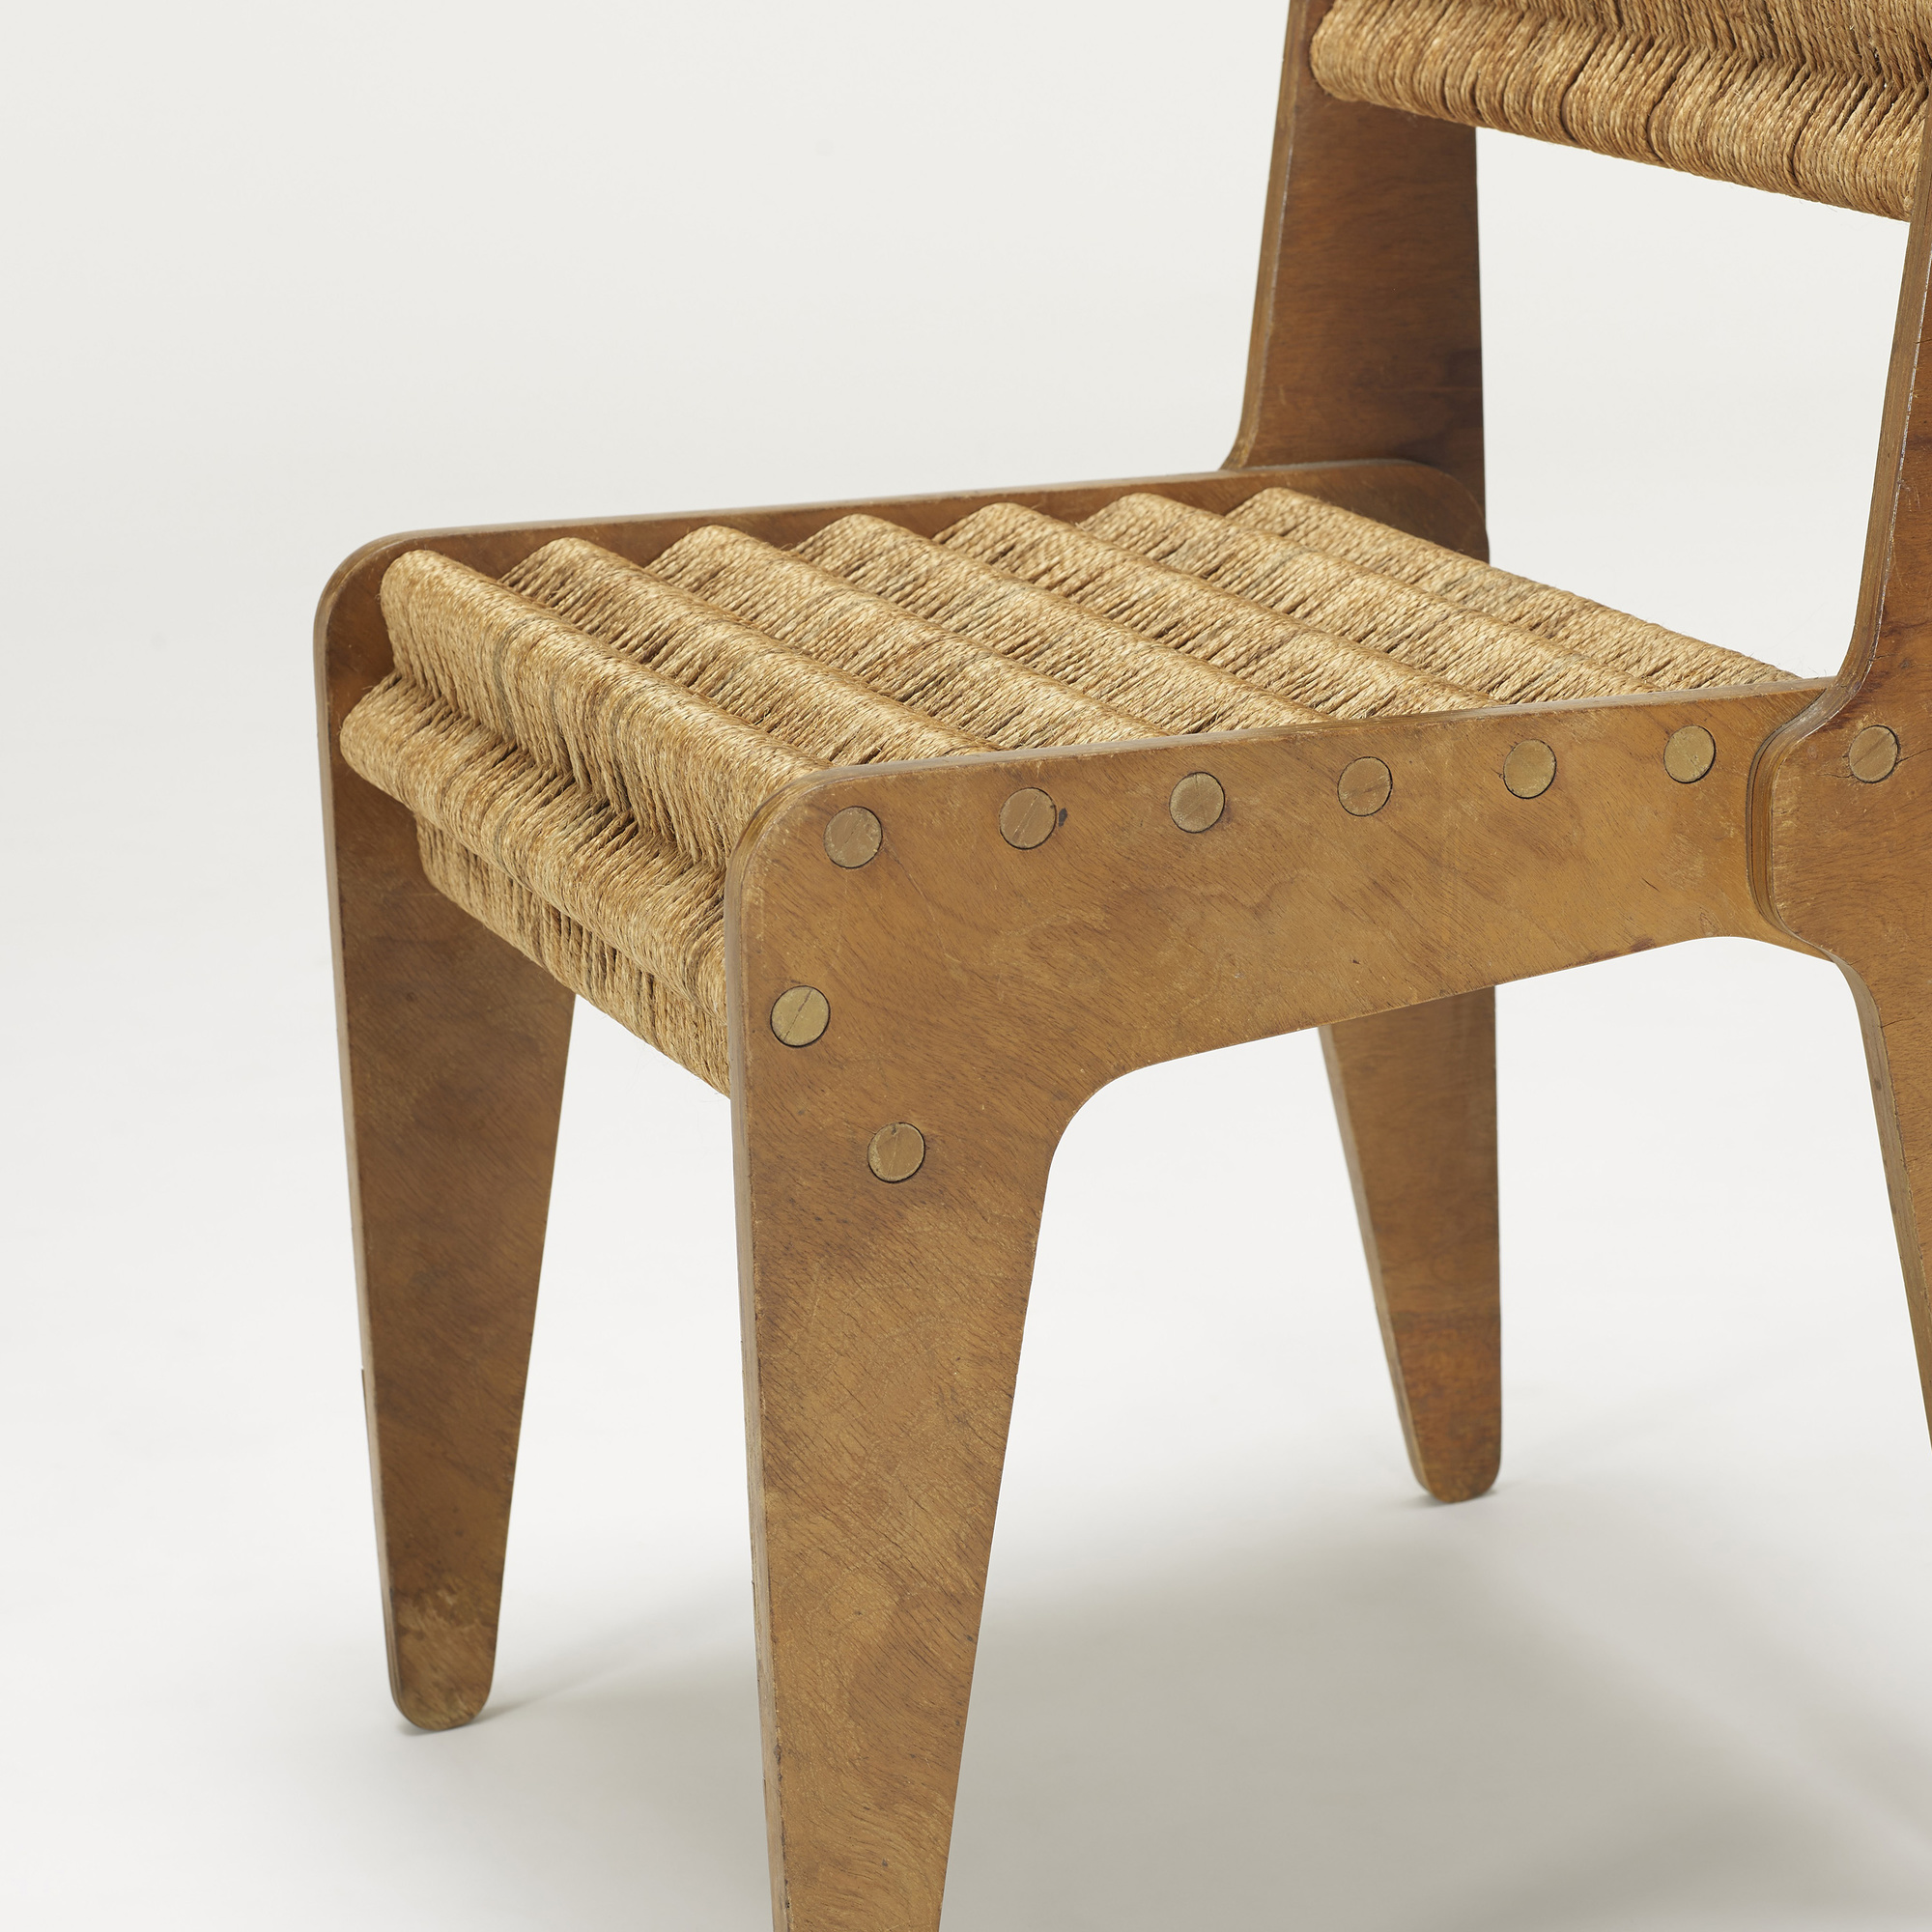 279 MARCEL BREUER Important prototype chair for Bryn Mawr